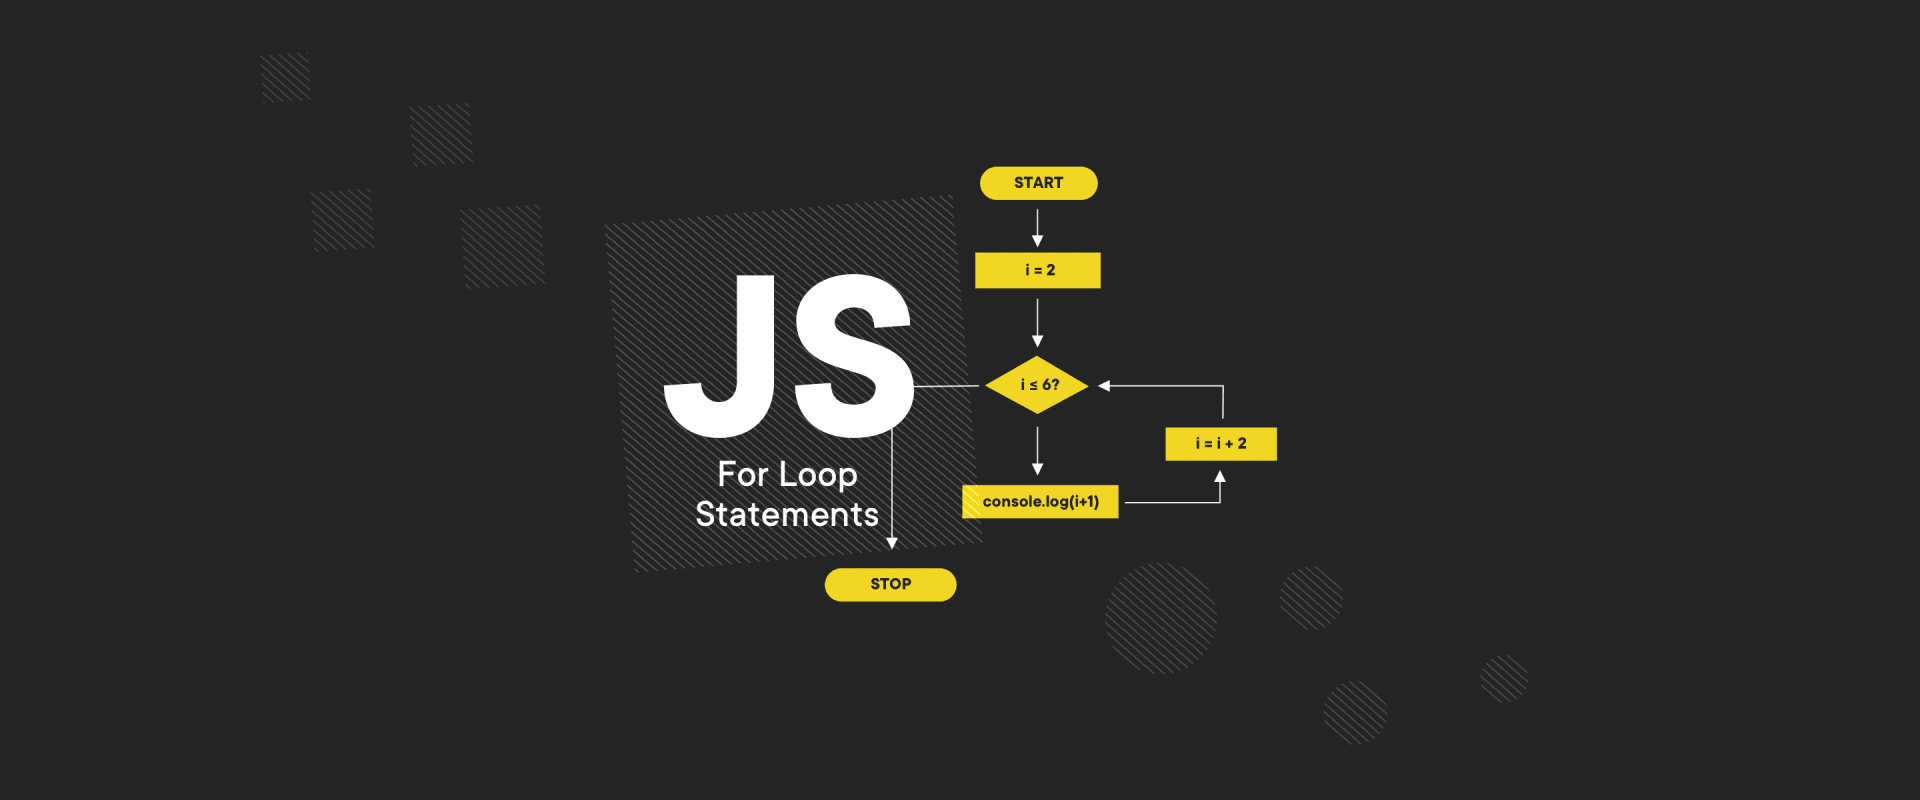 Javascript's For Loop Statements